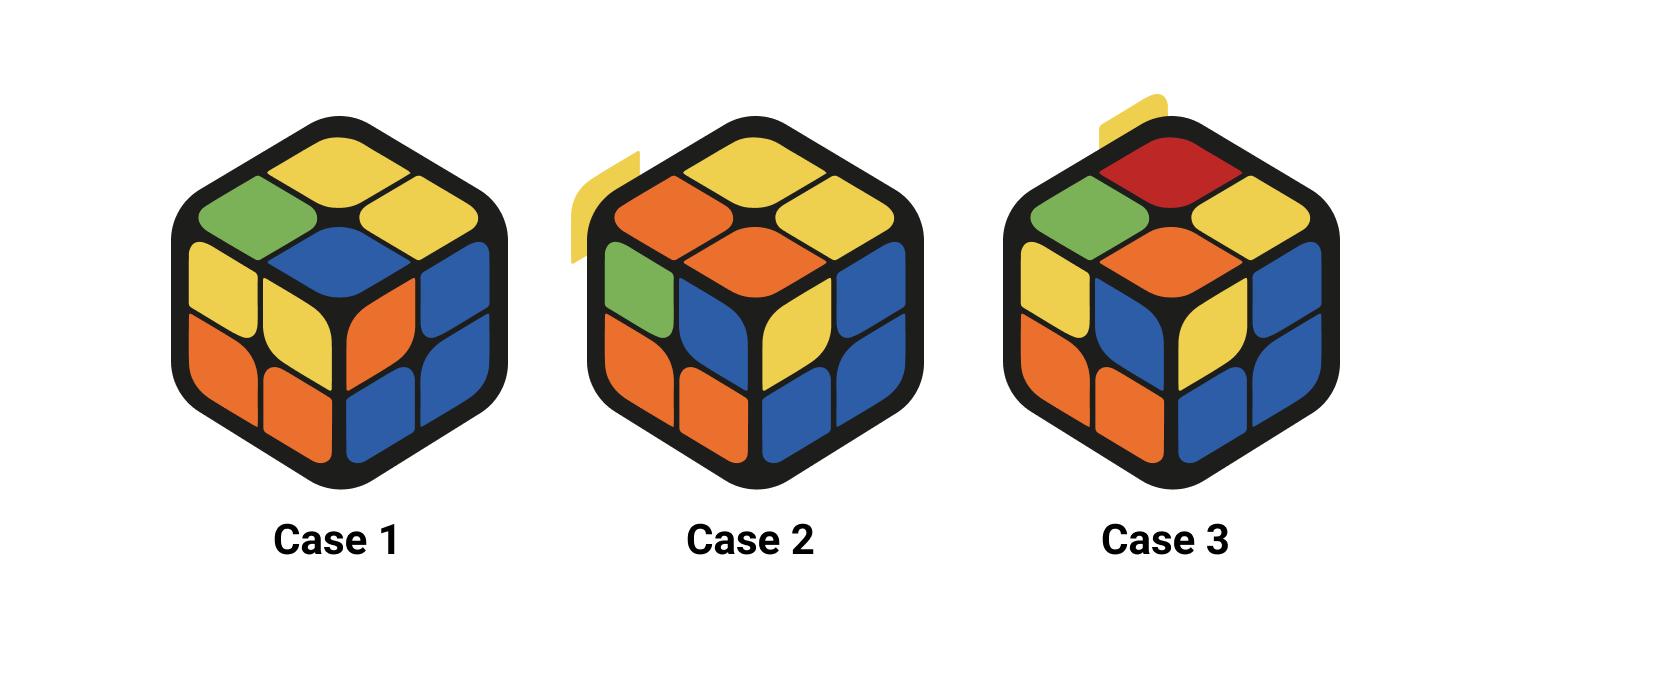 2x2x2 Case 4 - how to solve 2x2 rubik's cube